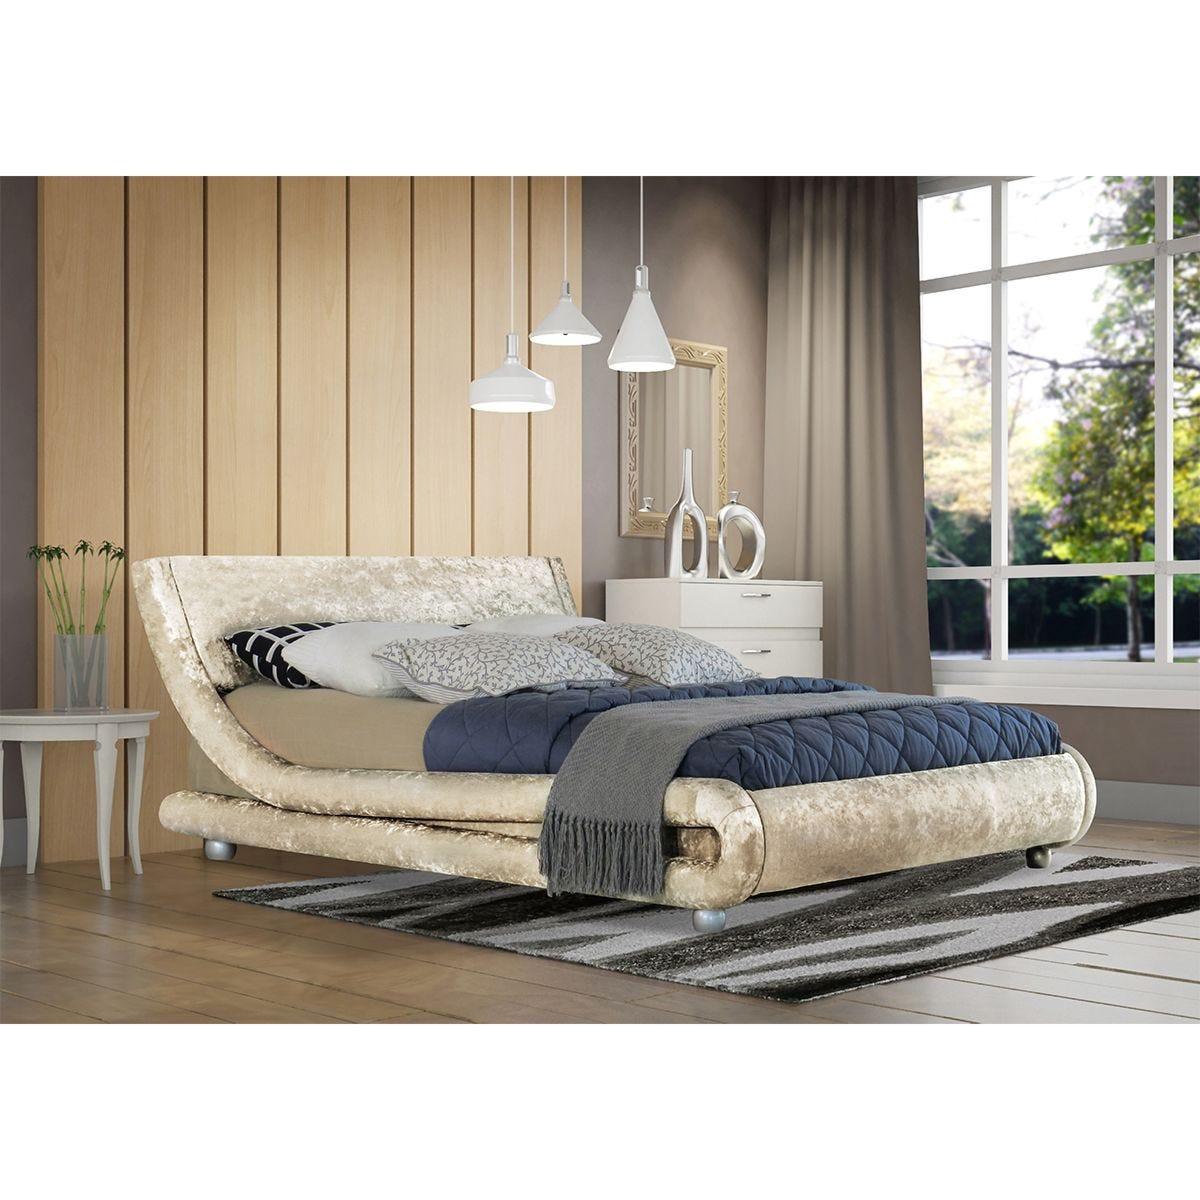 Grayson Bed Frame - Cream